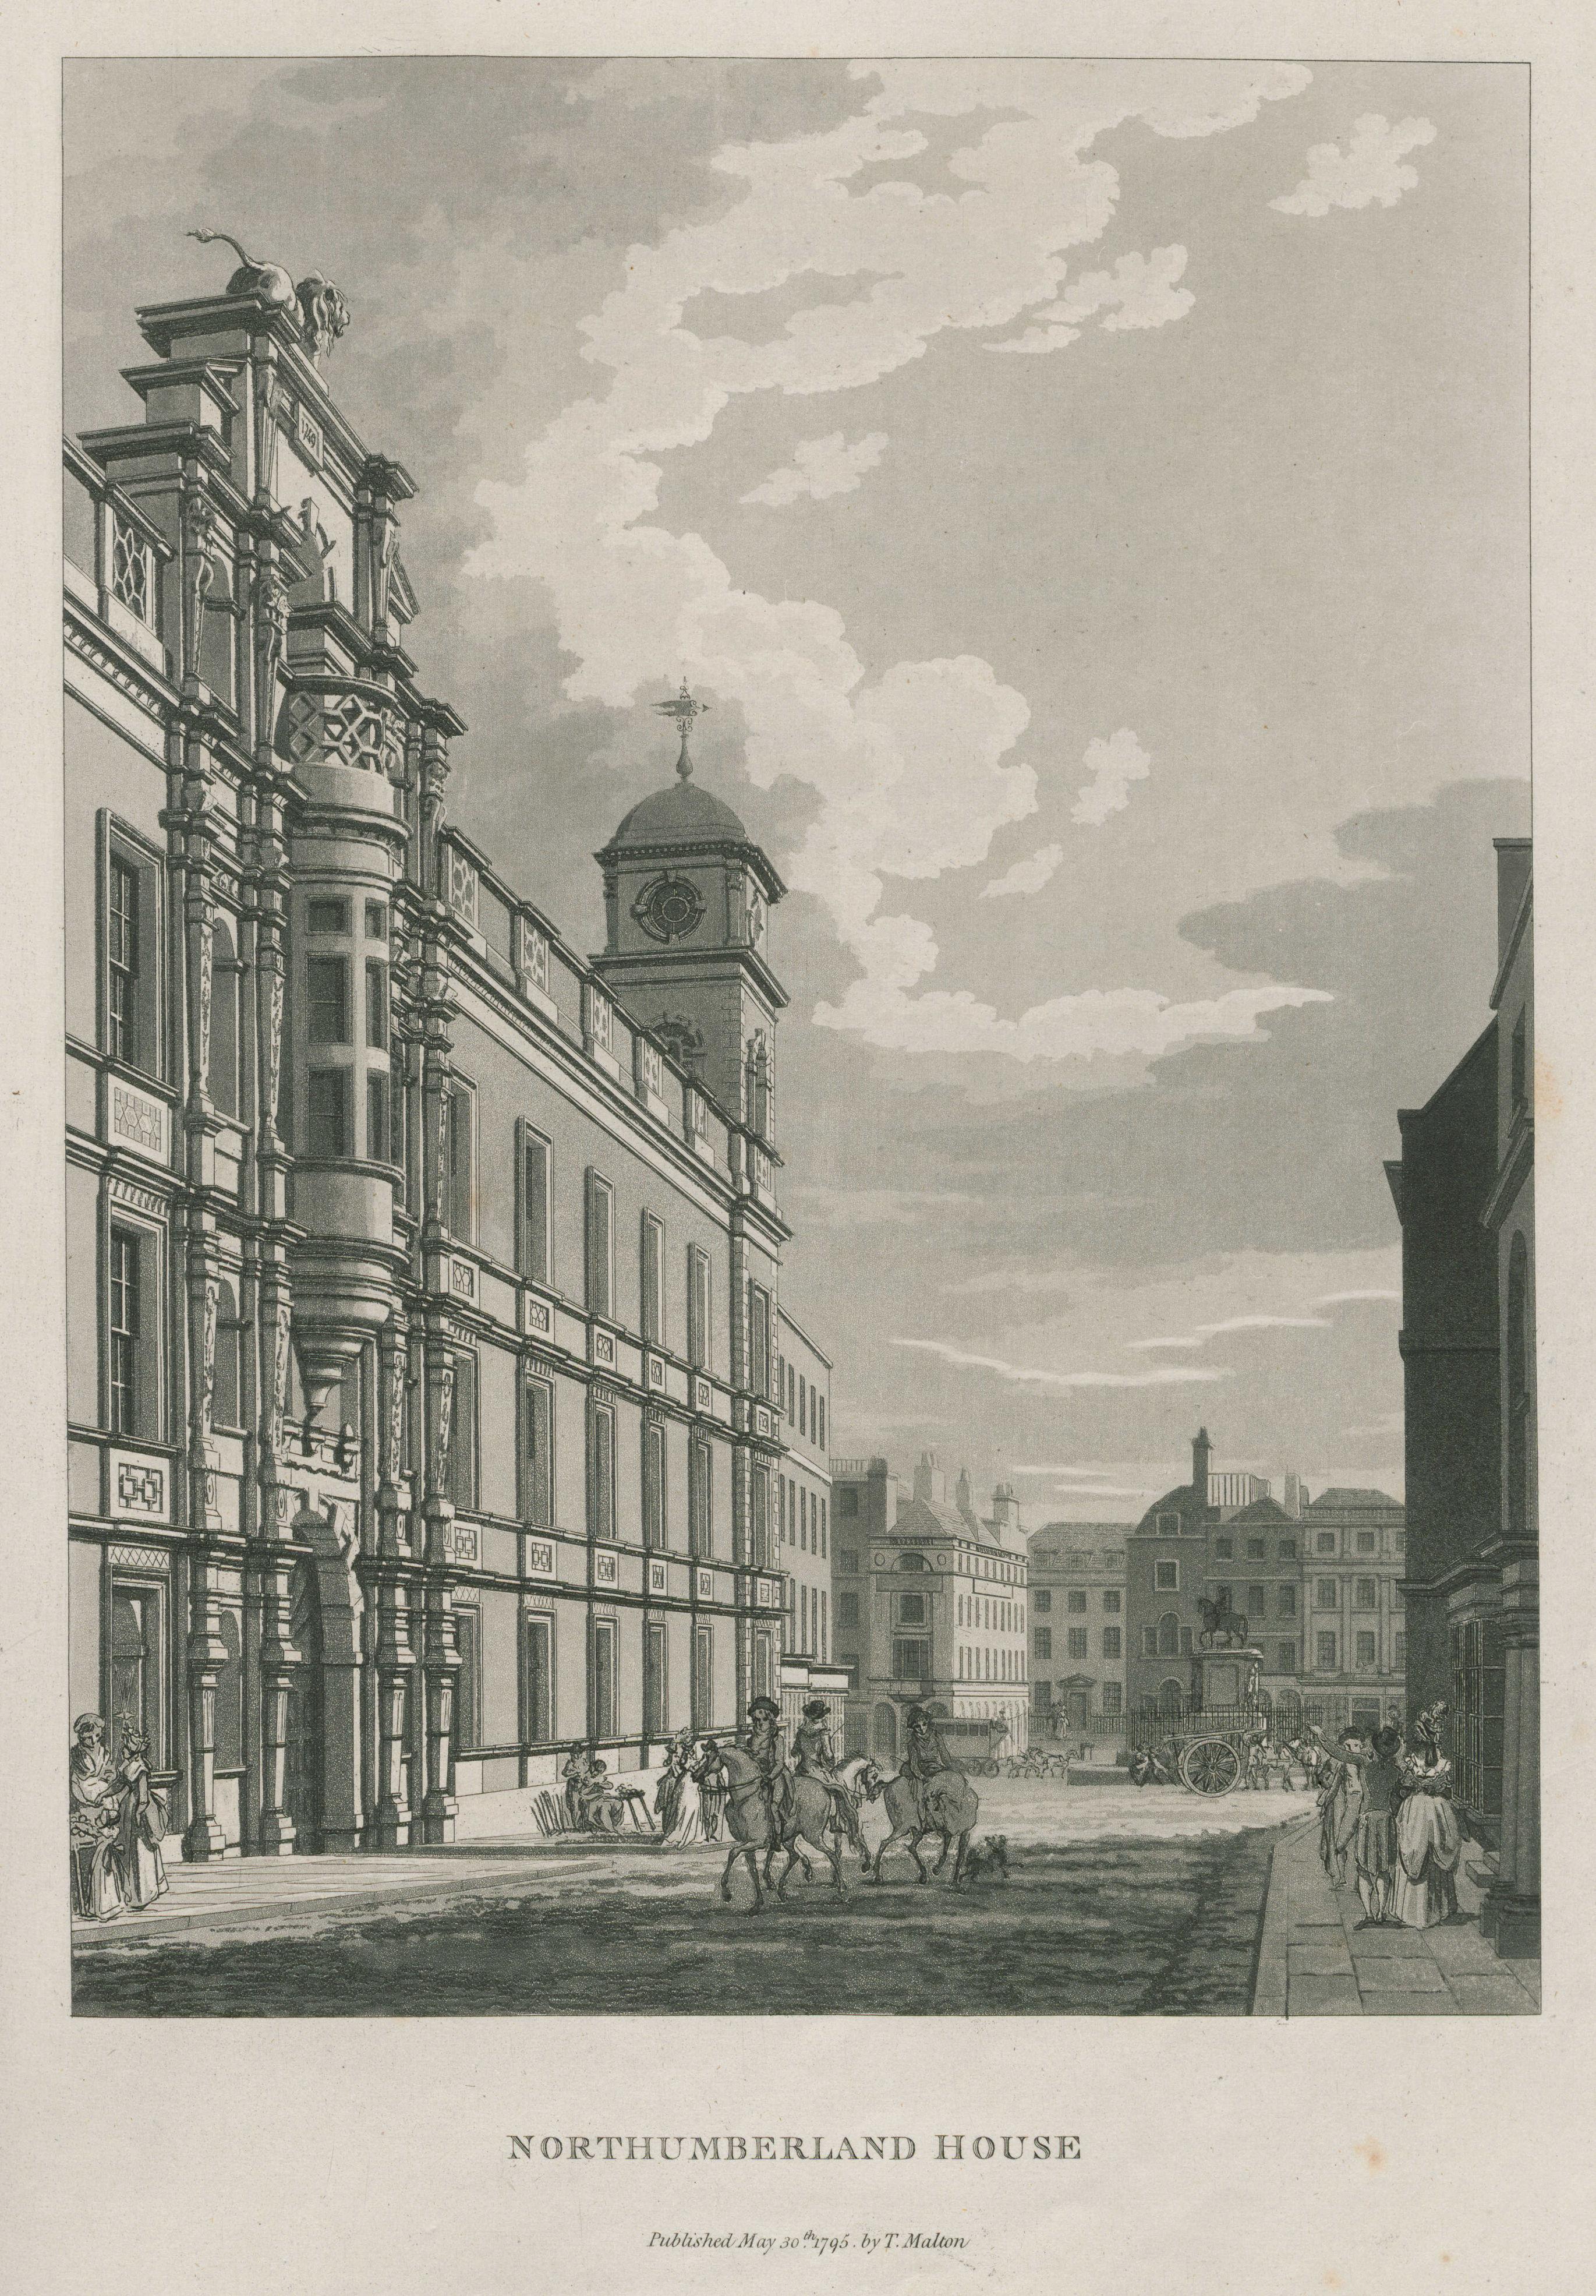 026 - Malton - Northumberland House